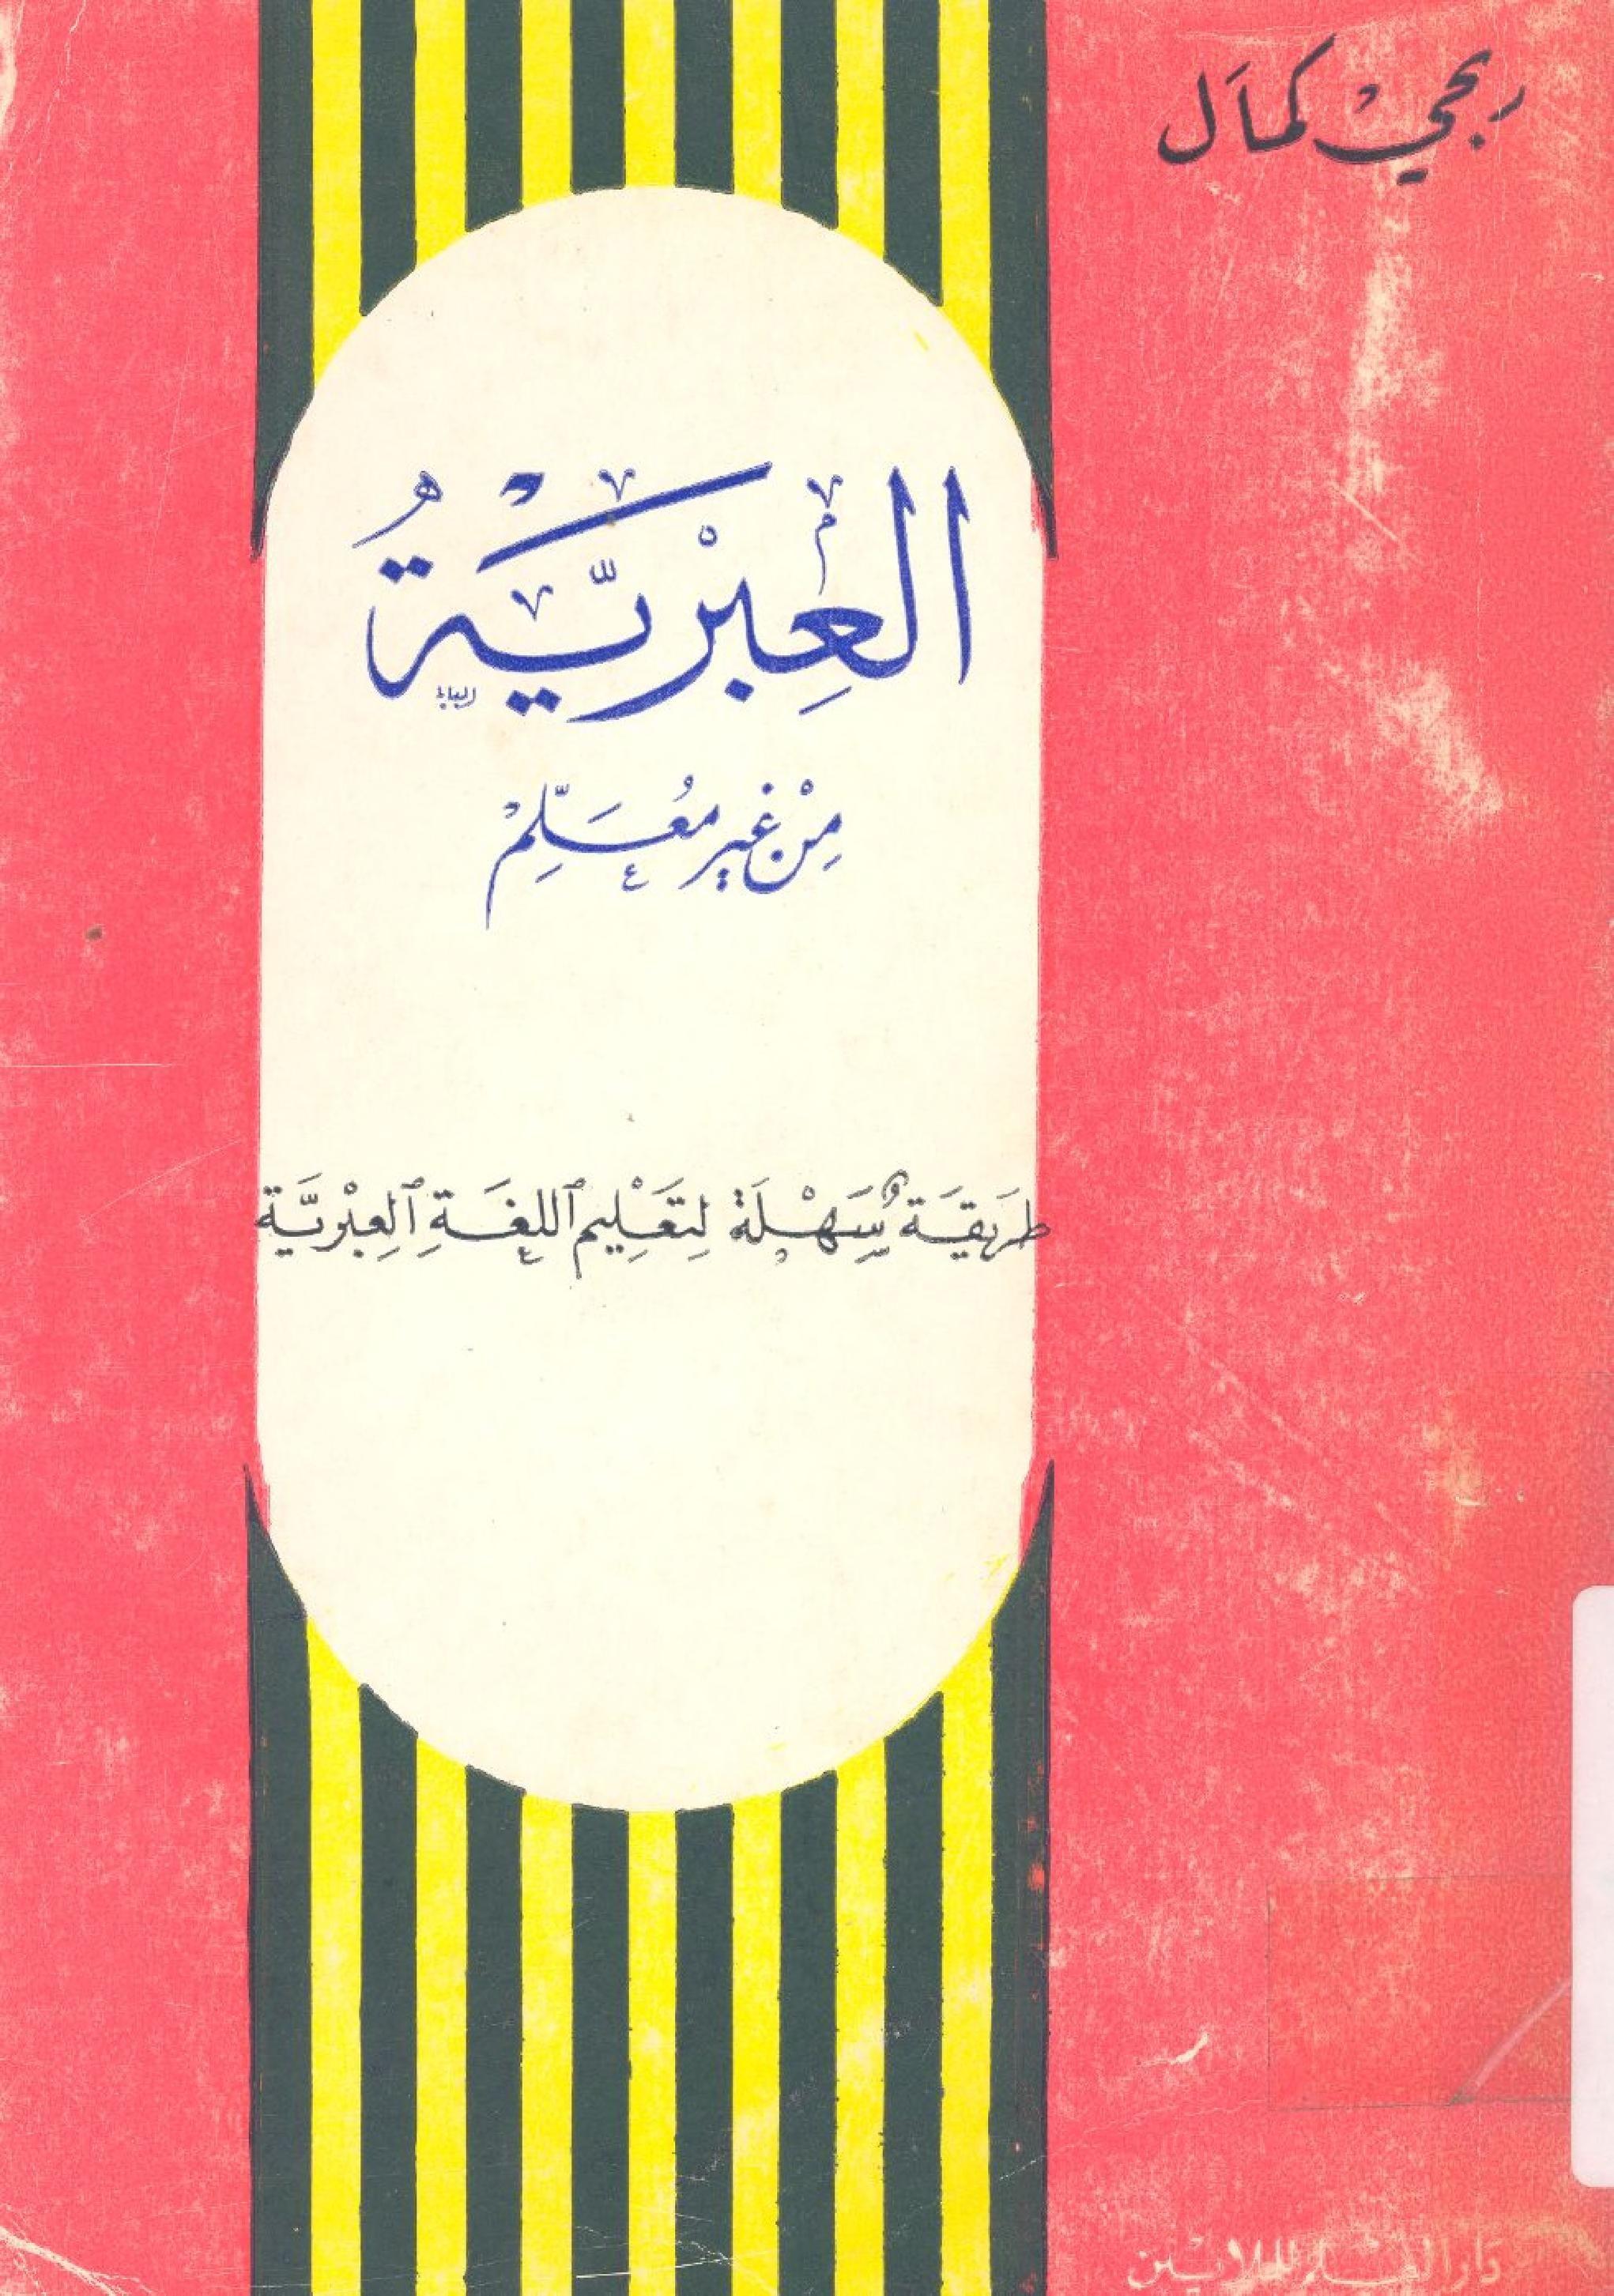 Https Archive Org Stream 20191110 20191110 1349 العبرية من غير معلم طريقة سهلة فى تعلم اللغة العبرية In 2020 Arabic Books Books Free Books